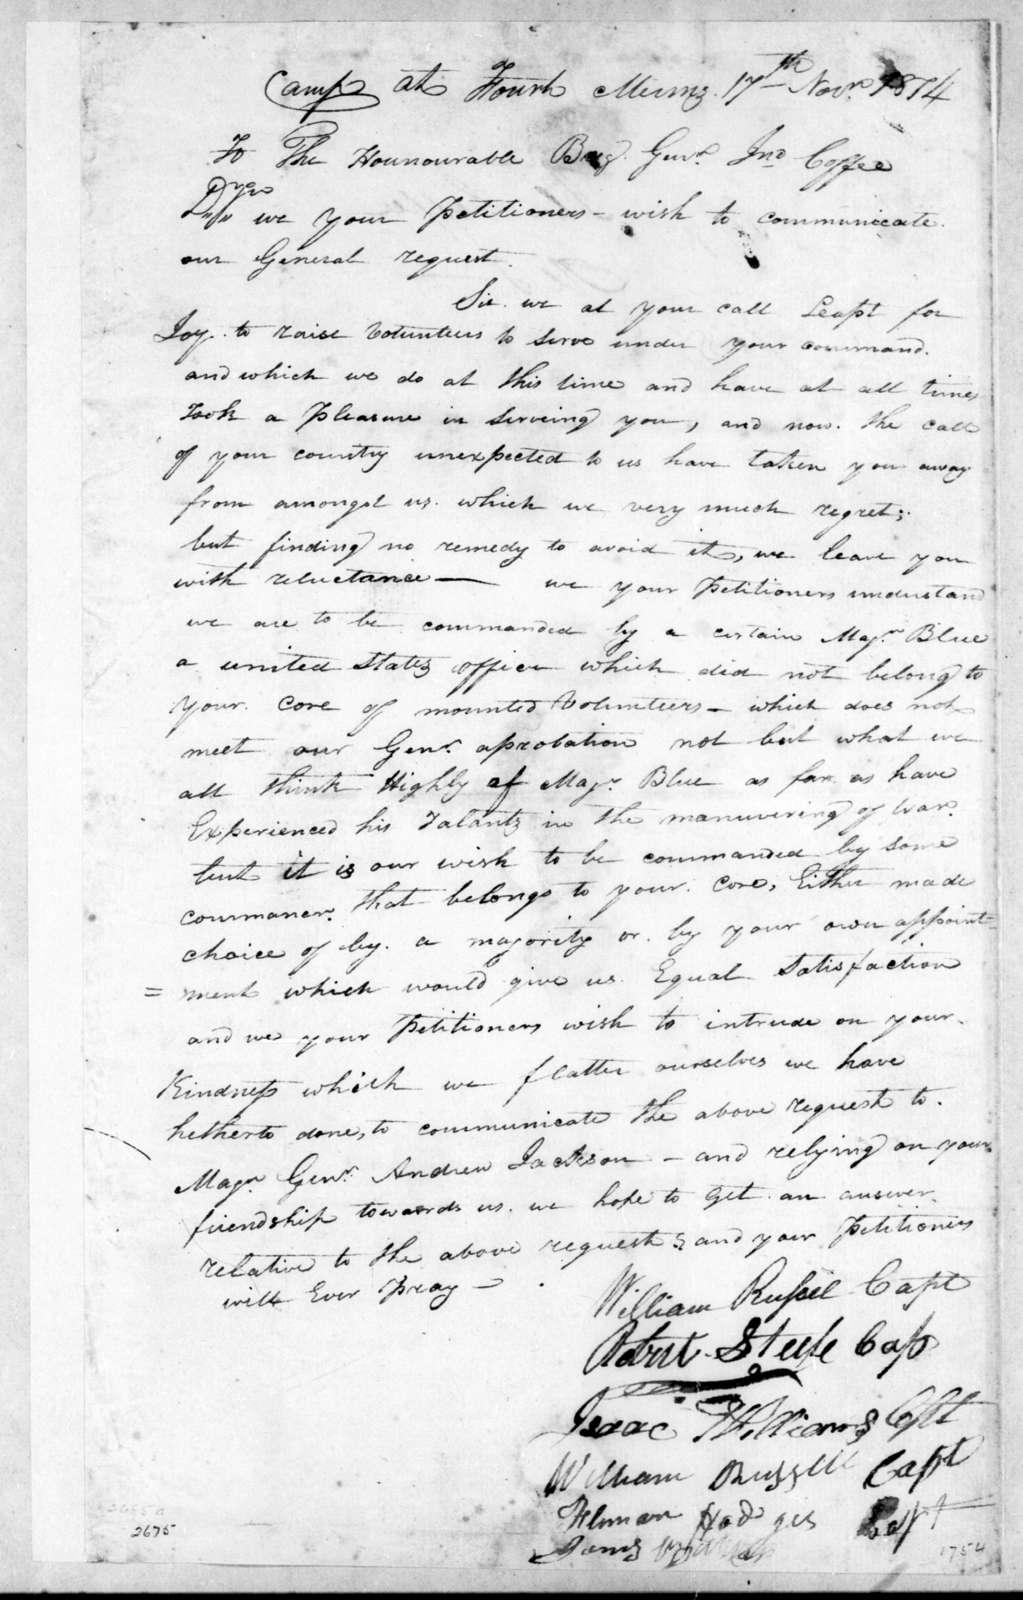 William Russell et al. to John Coffee, November 17, 1814